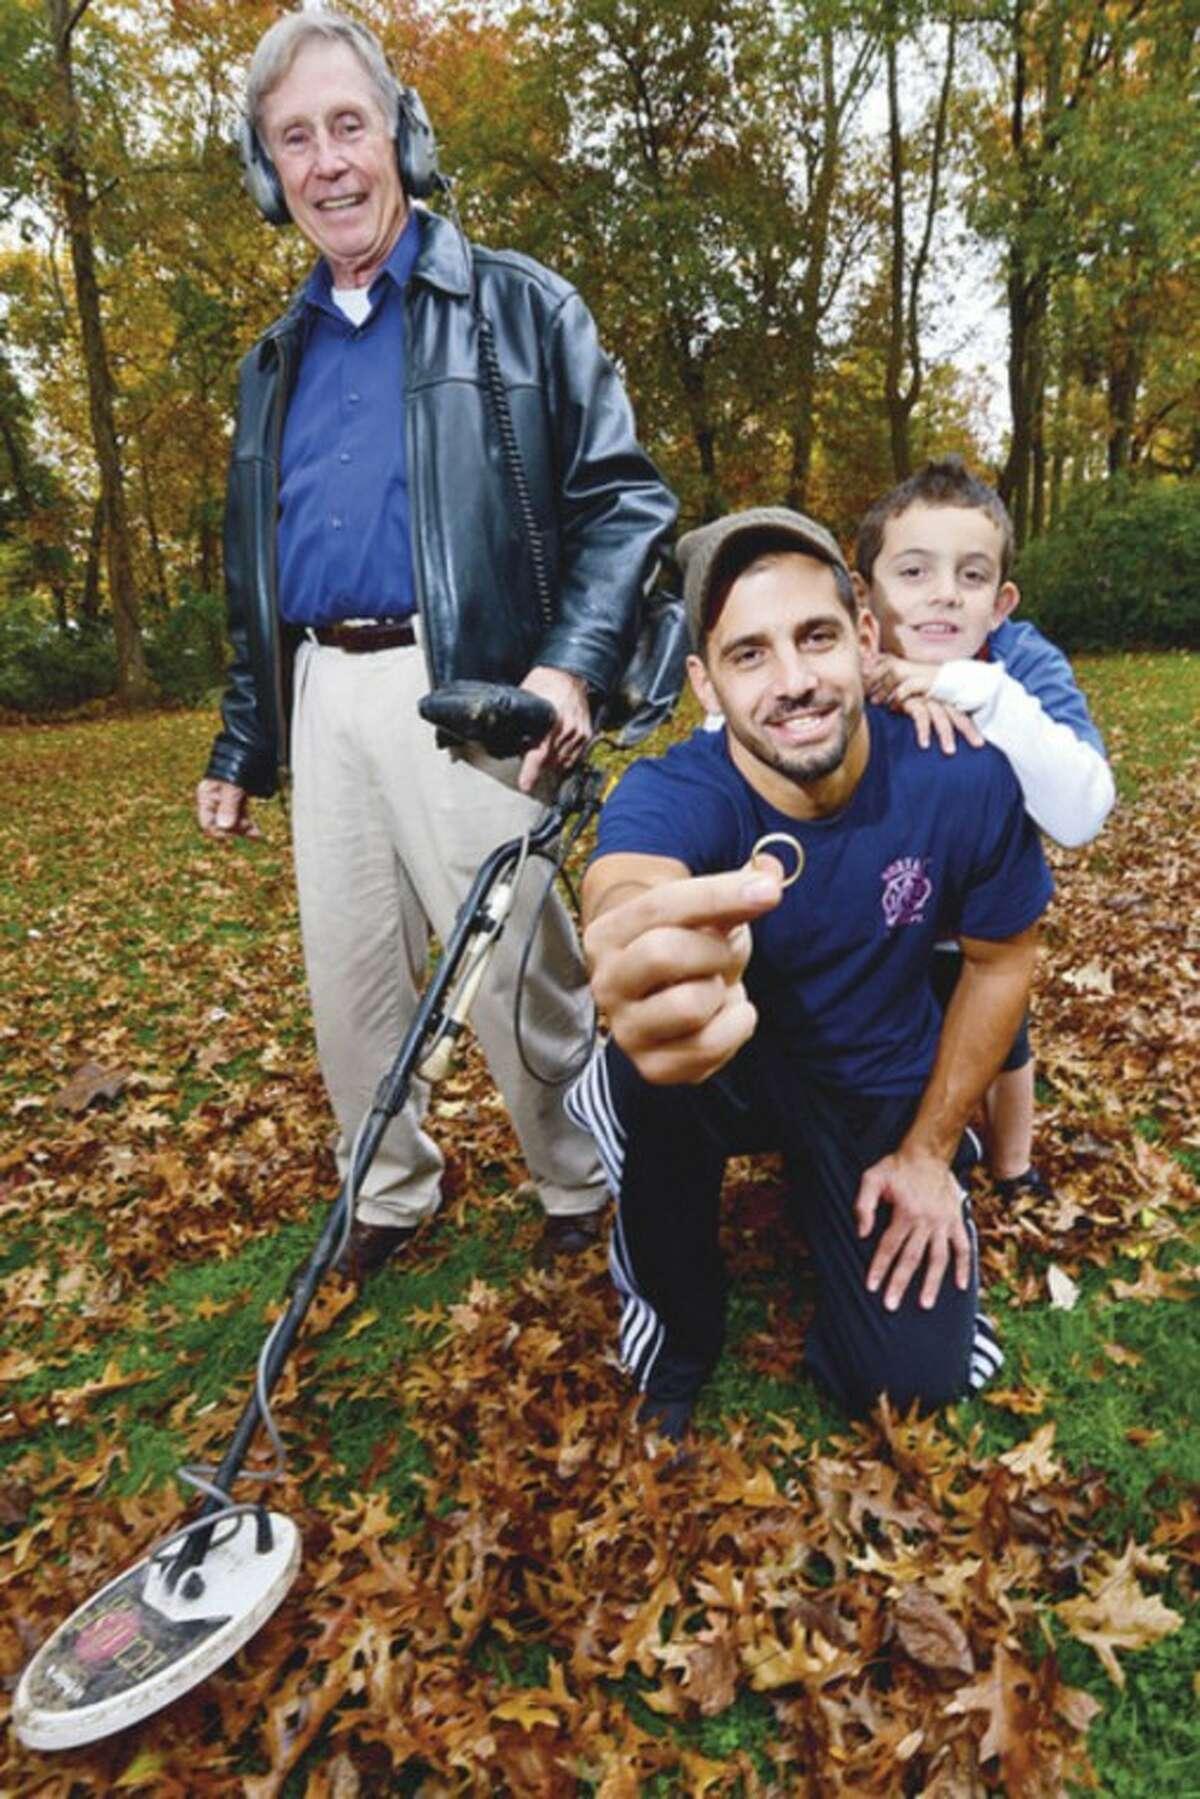 Hour photo / Erik Trautmann Metal detecting enthusiast Dan Godleski, standing, found John Kodonas' wedding ring, which his son Konstantinos had lost four years earlier.